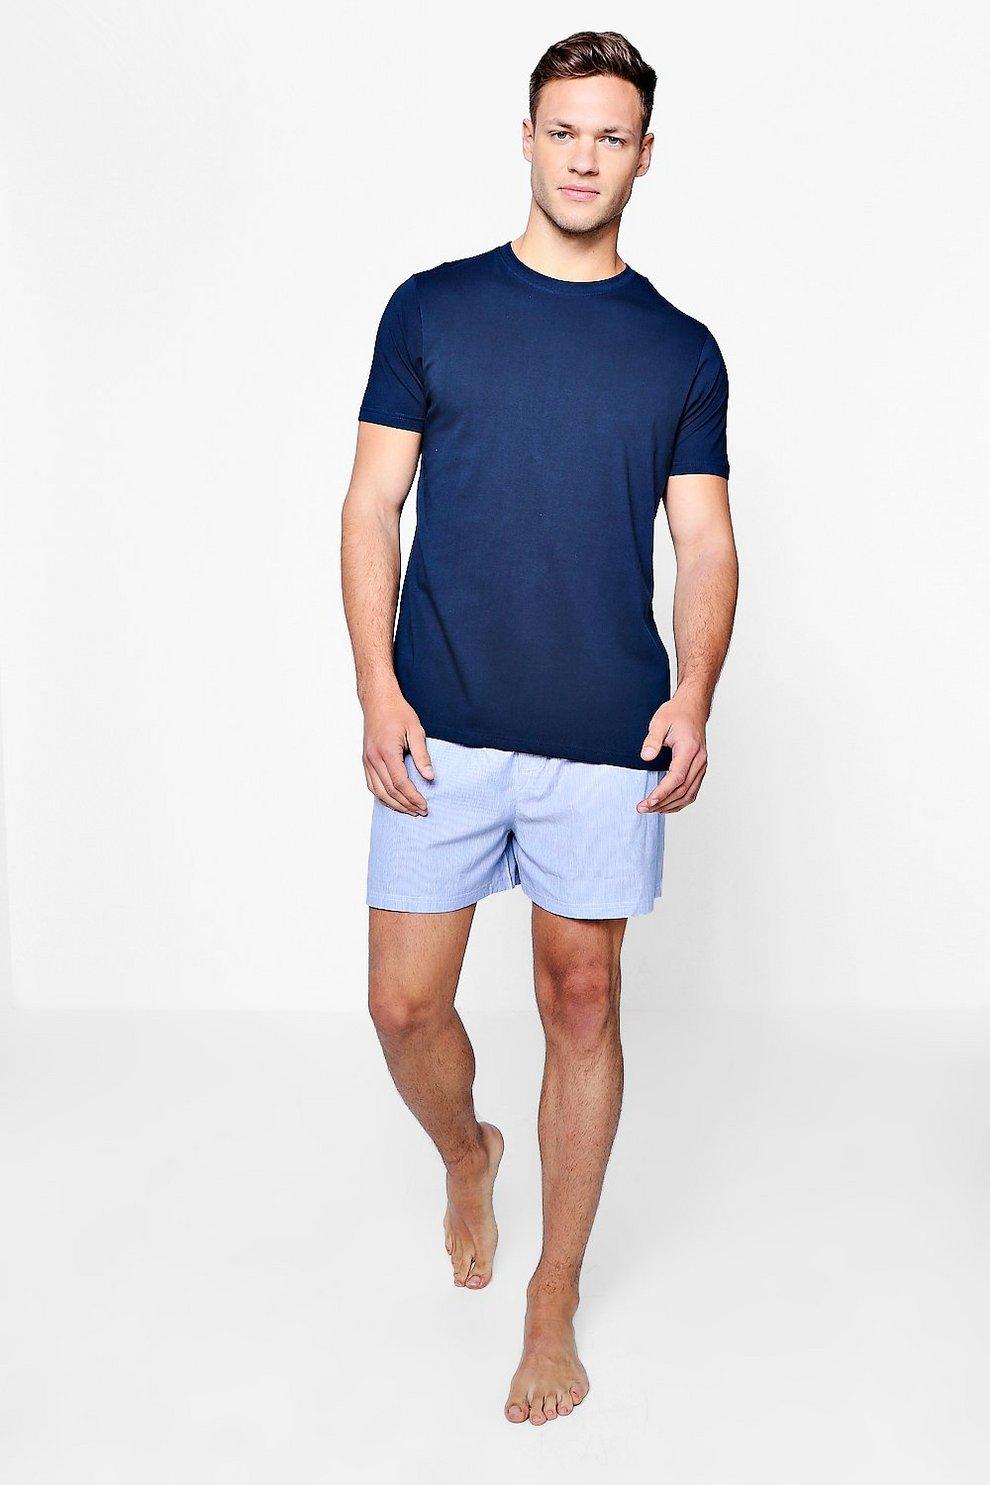 fcdd9a4987699 Ensemble de pyjama t-Shirt & short tissé homme | Boohoo